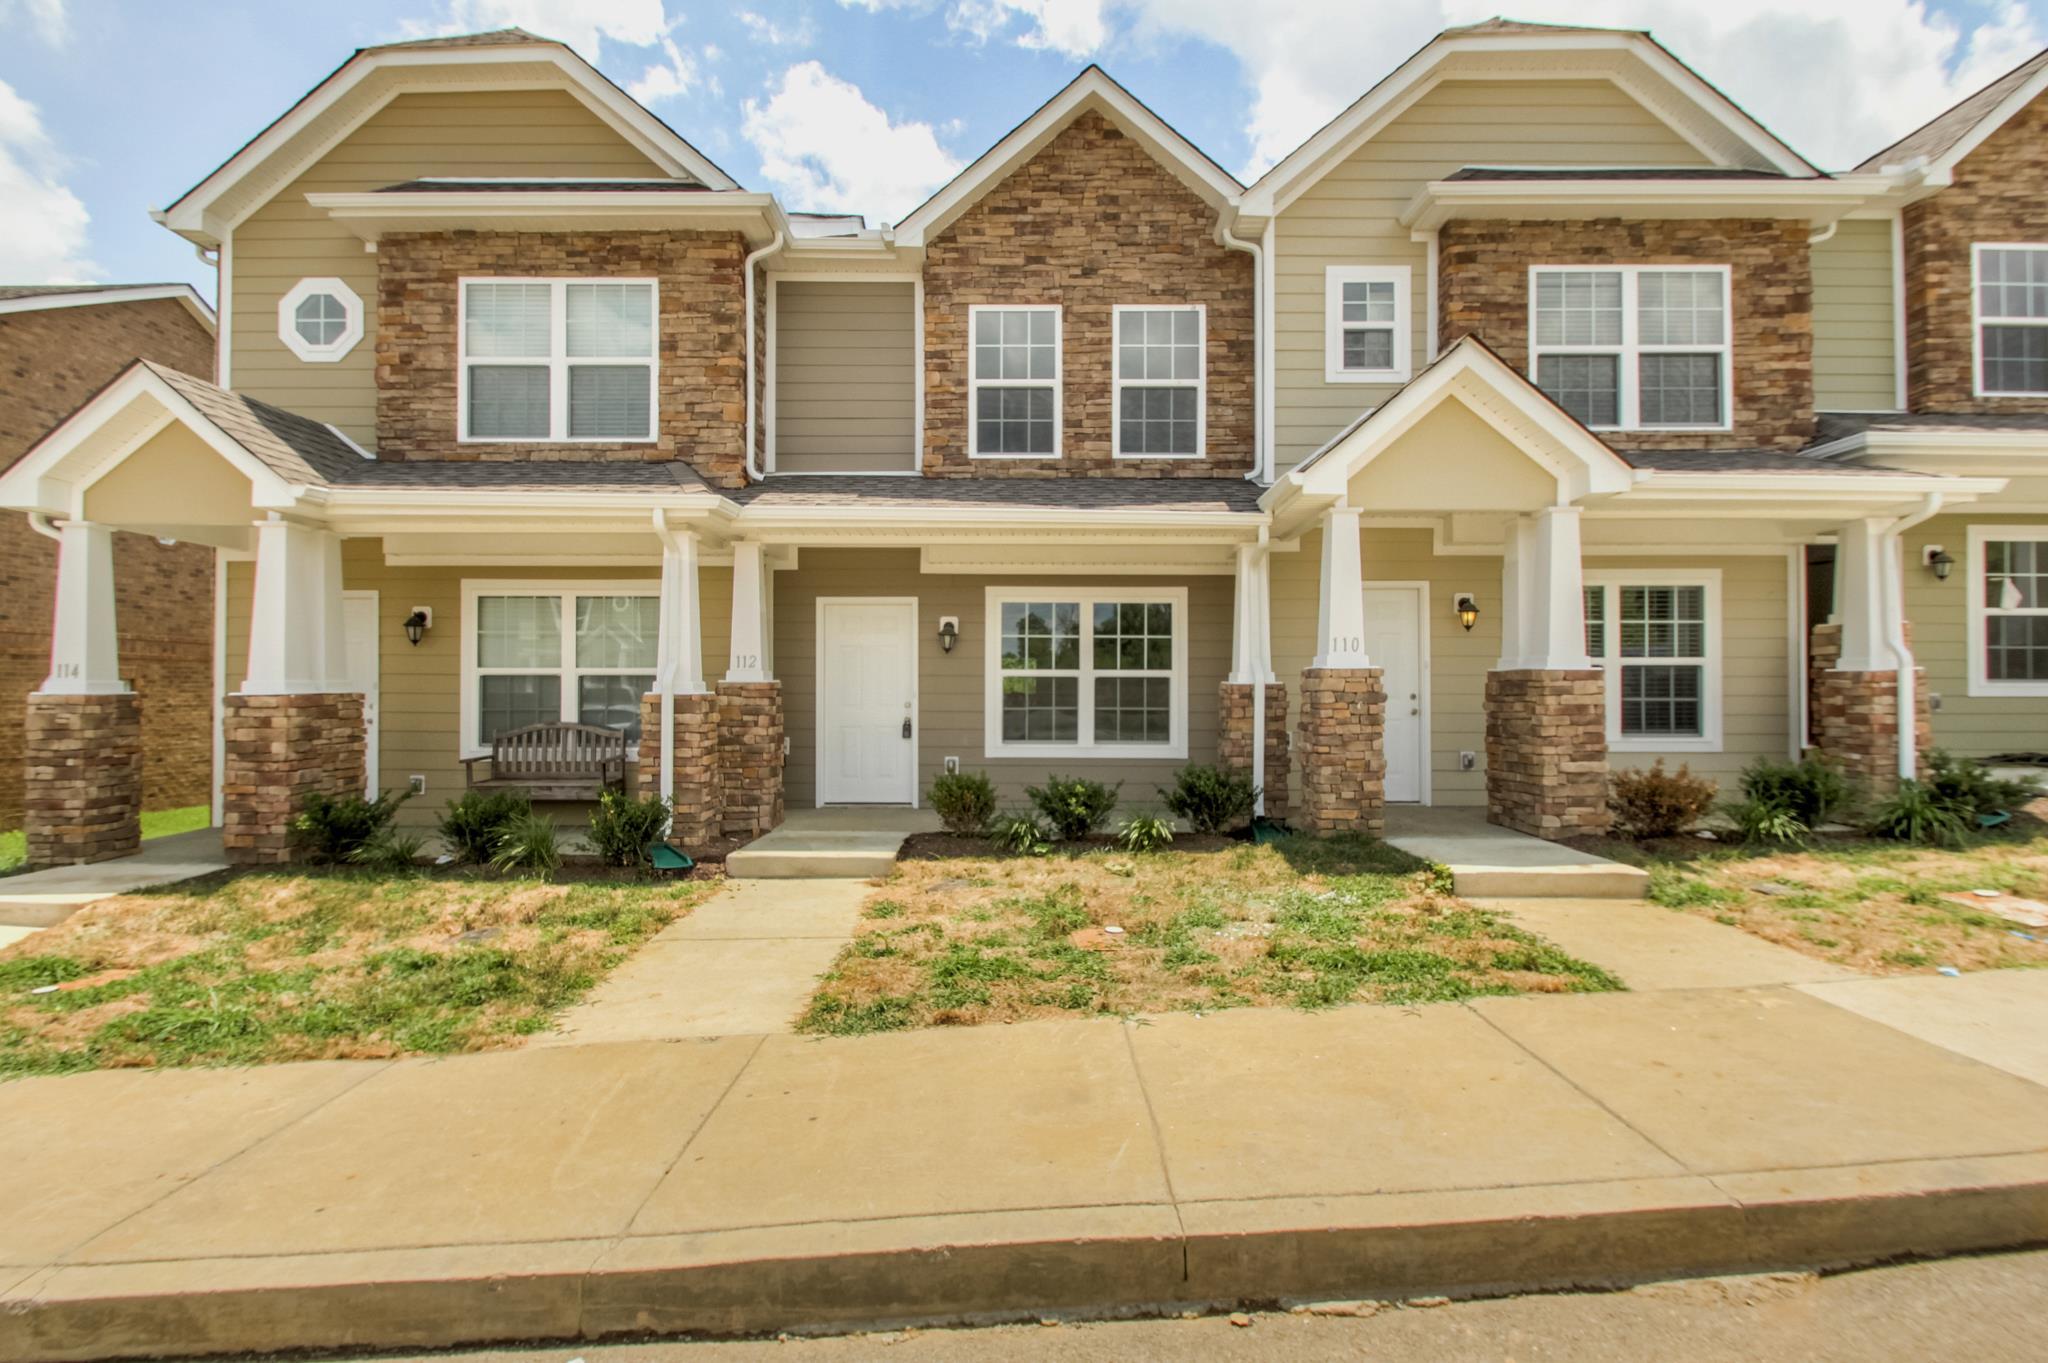 Photo of 133 Cobblestone Place Dr  Goodlettsville  TN